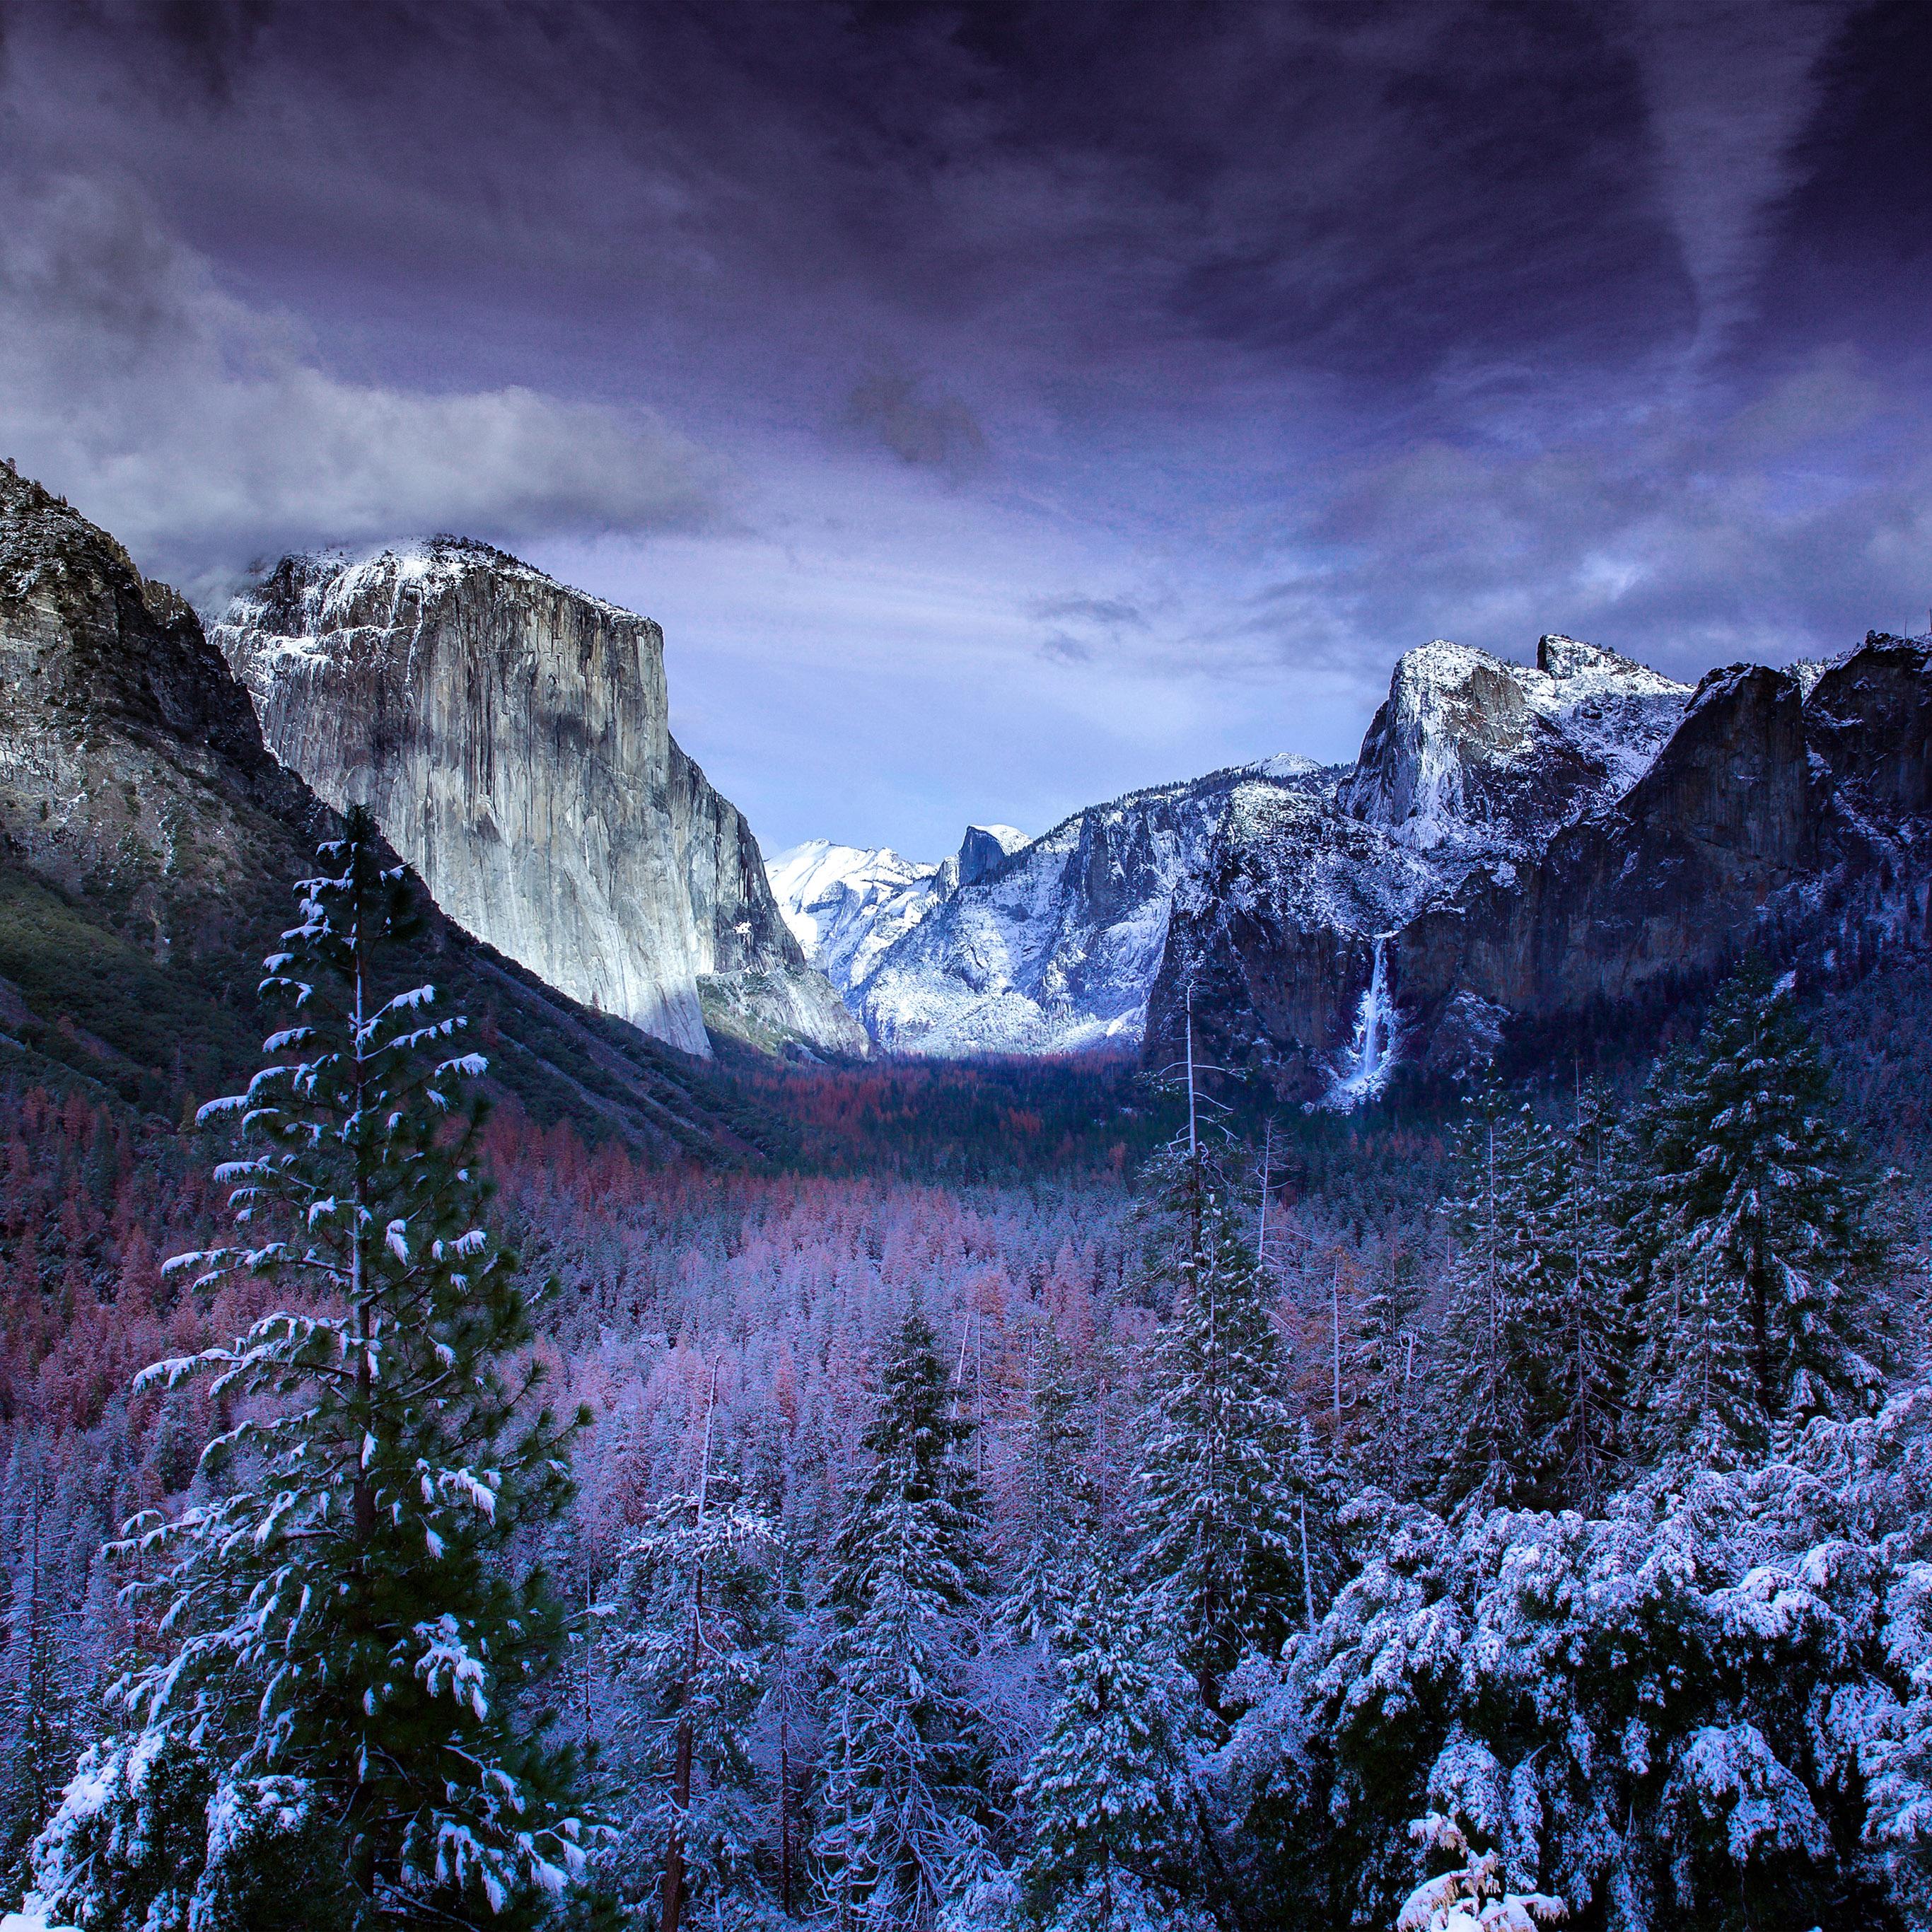 Winter Wallpaper: Nu16-winter-mountain-snow-nature-wallpaper